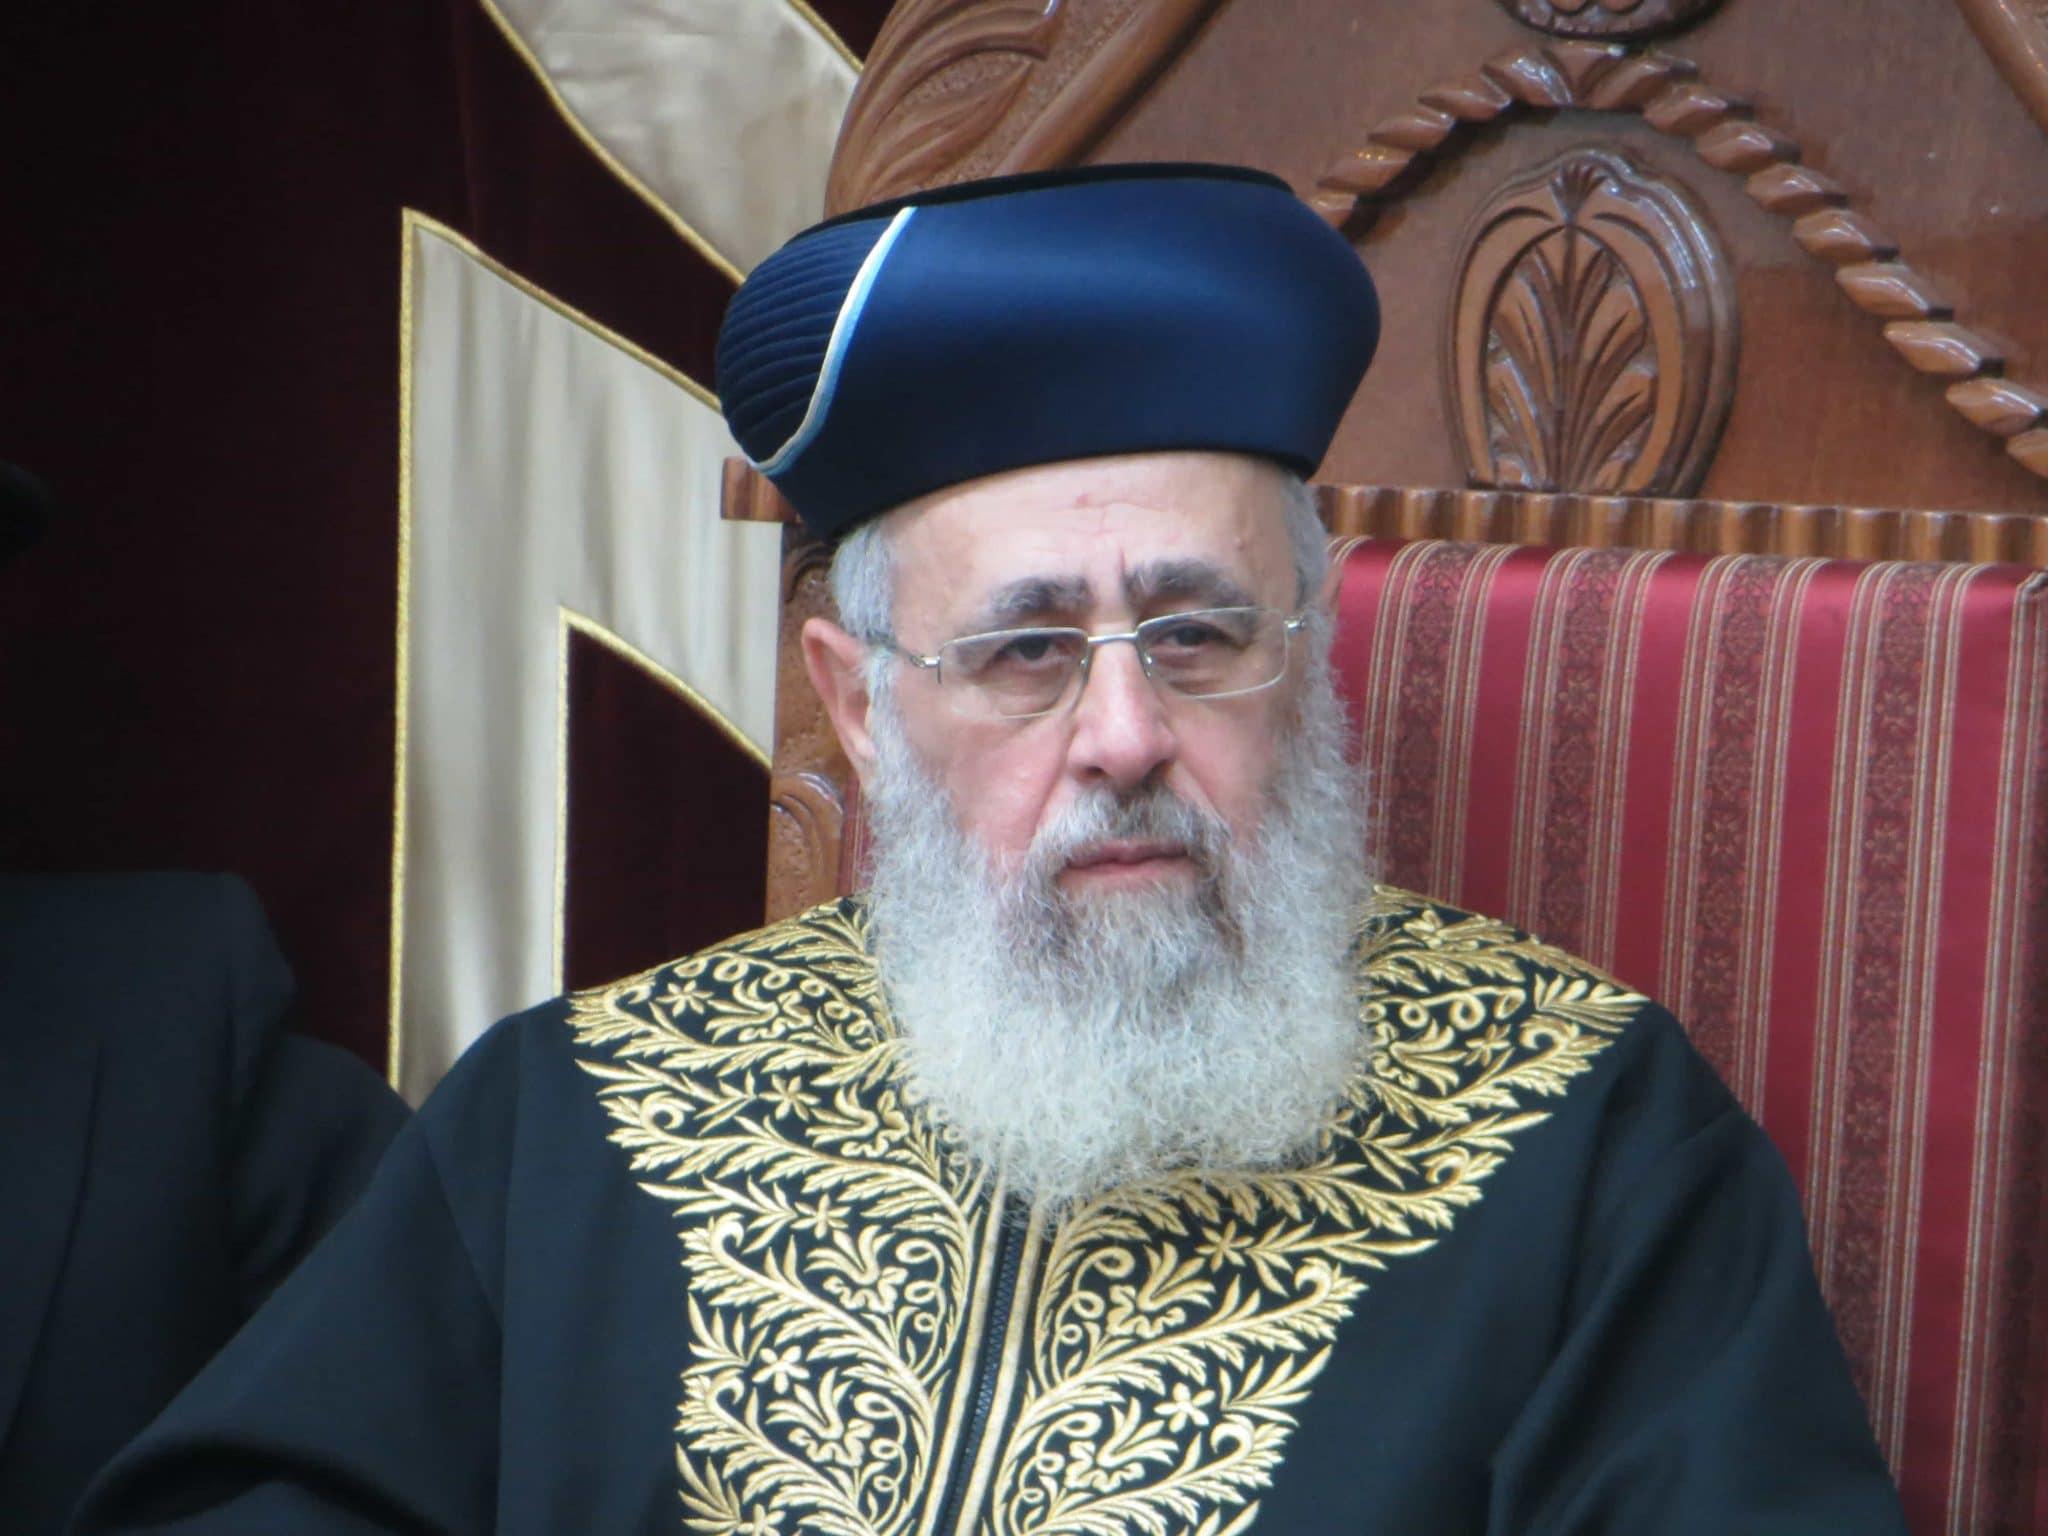 Ayin Its'hak - Lois sur la fête de Chavouot - Cours du Grand Rabbin D'Israël  Rabbénou Itshak Yossef Chlita